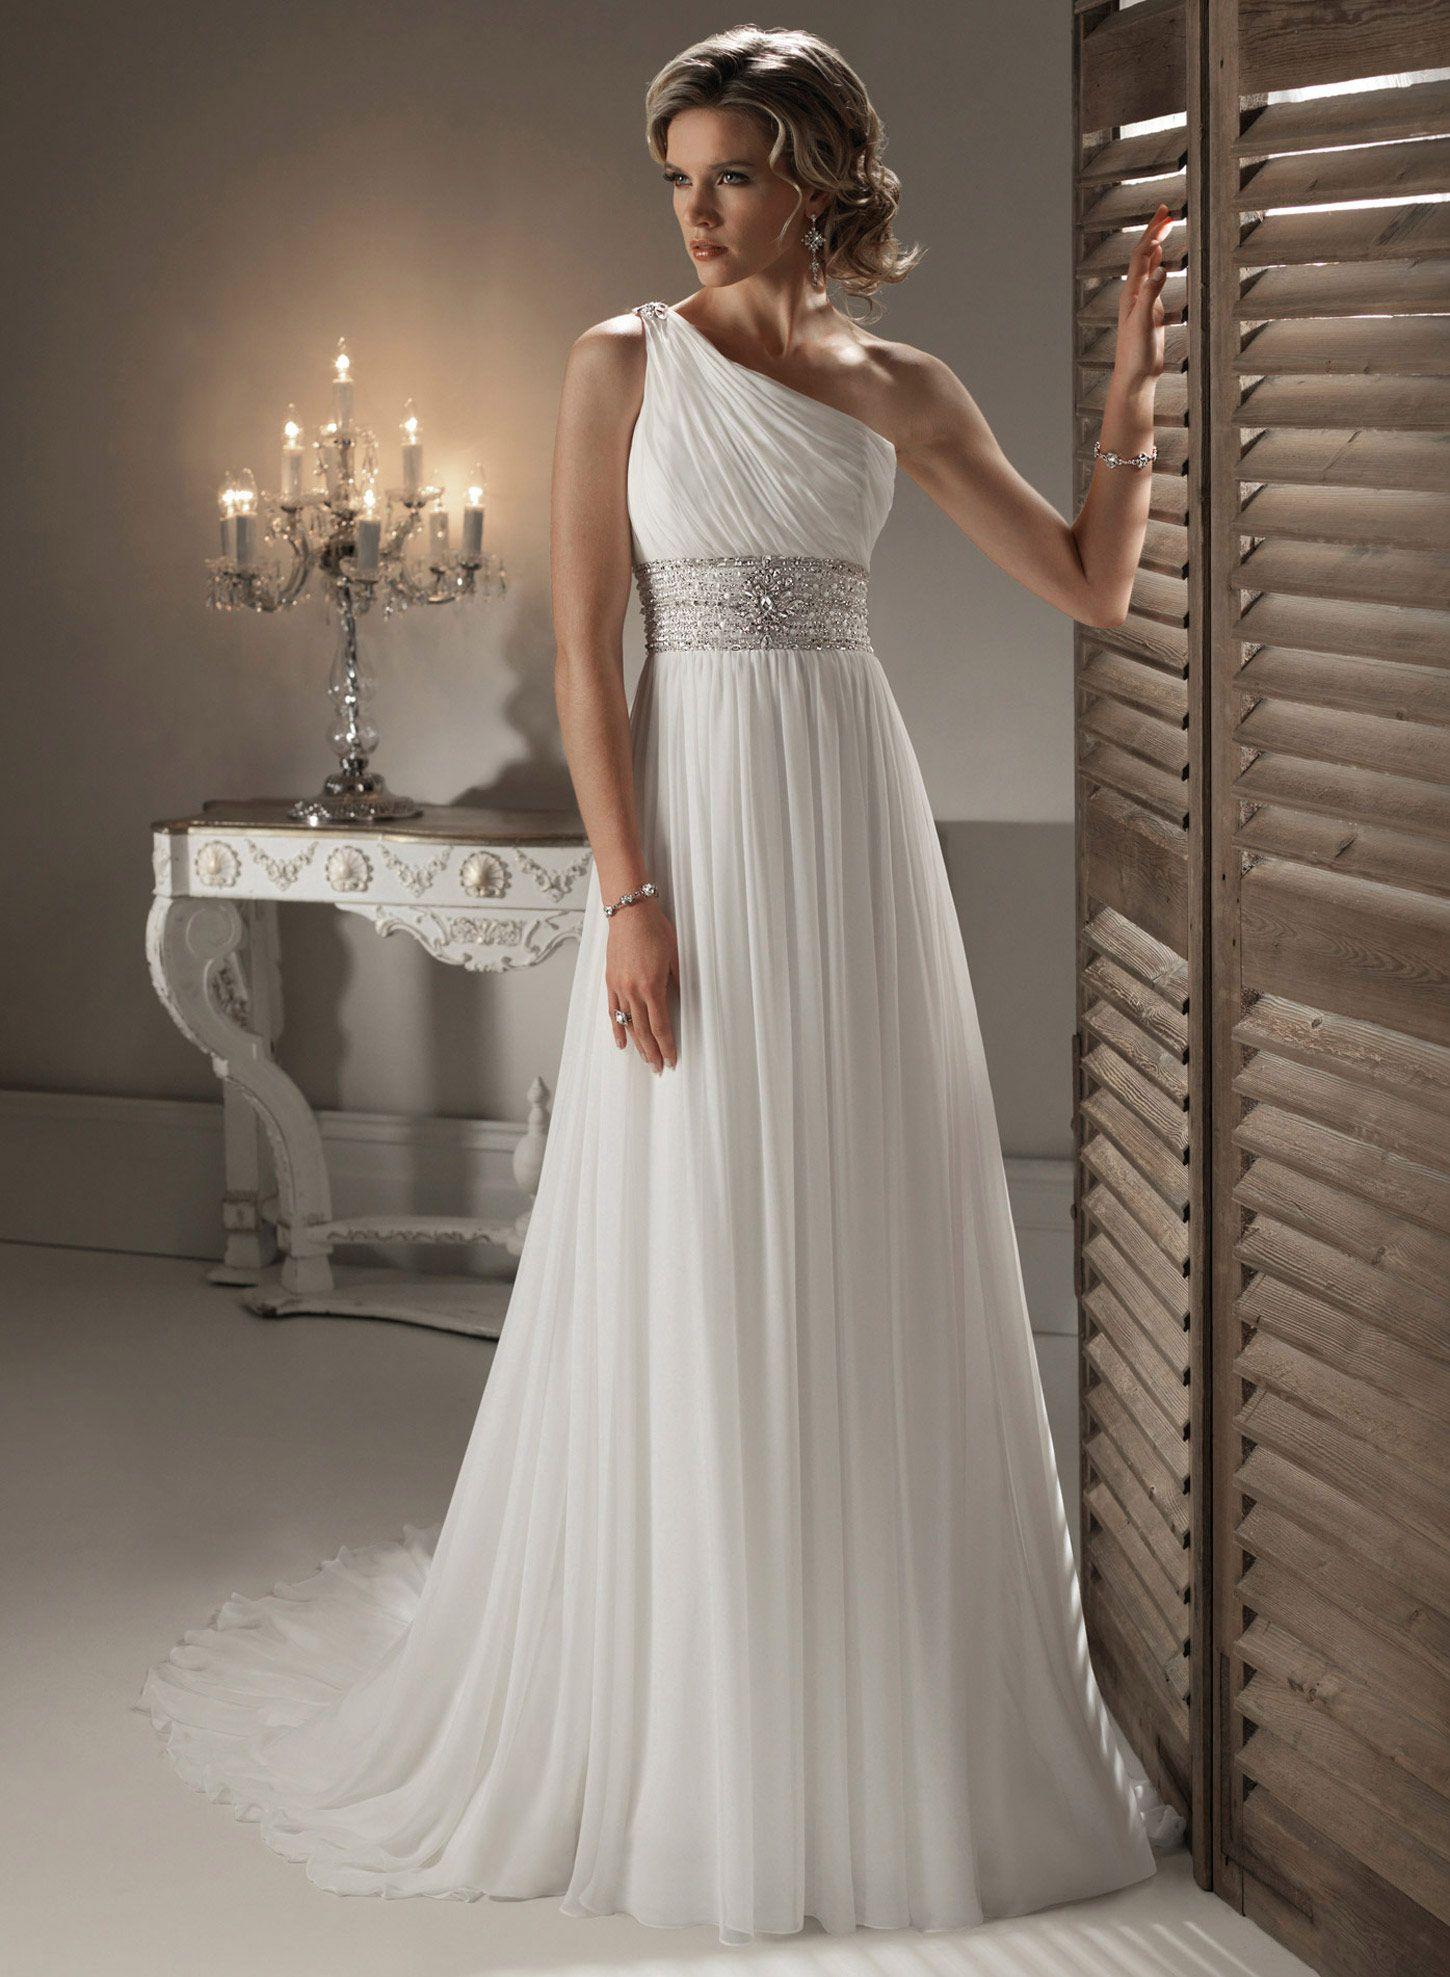 Fashion dress for wedding party  Maggie Sottero Asha One Shoulder Pleat Chiffon Wedding Dress Fashion